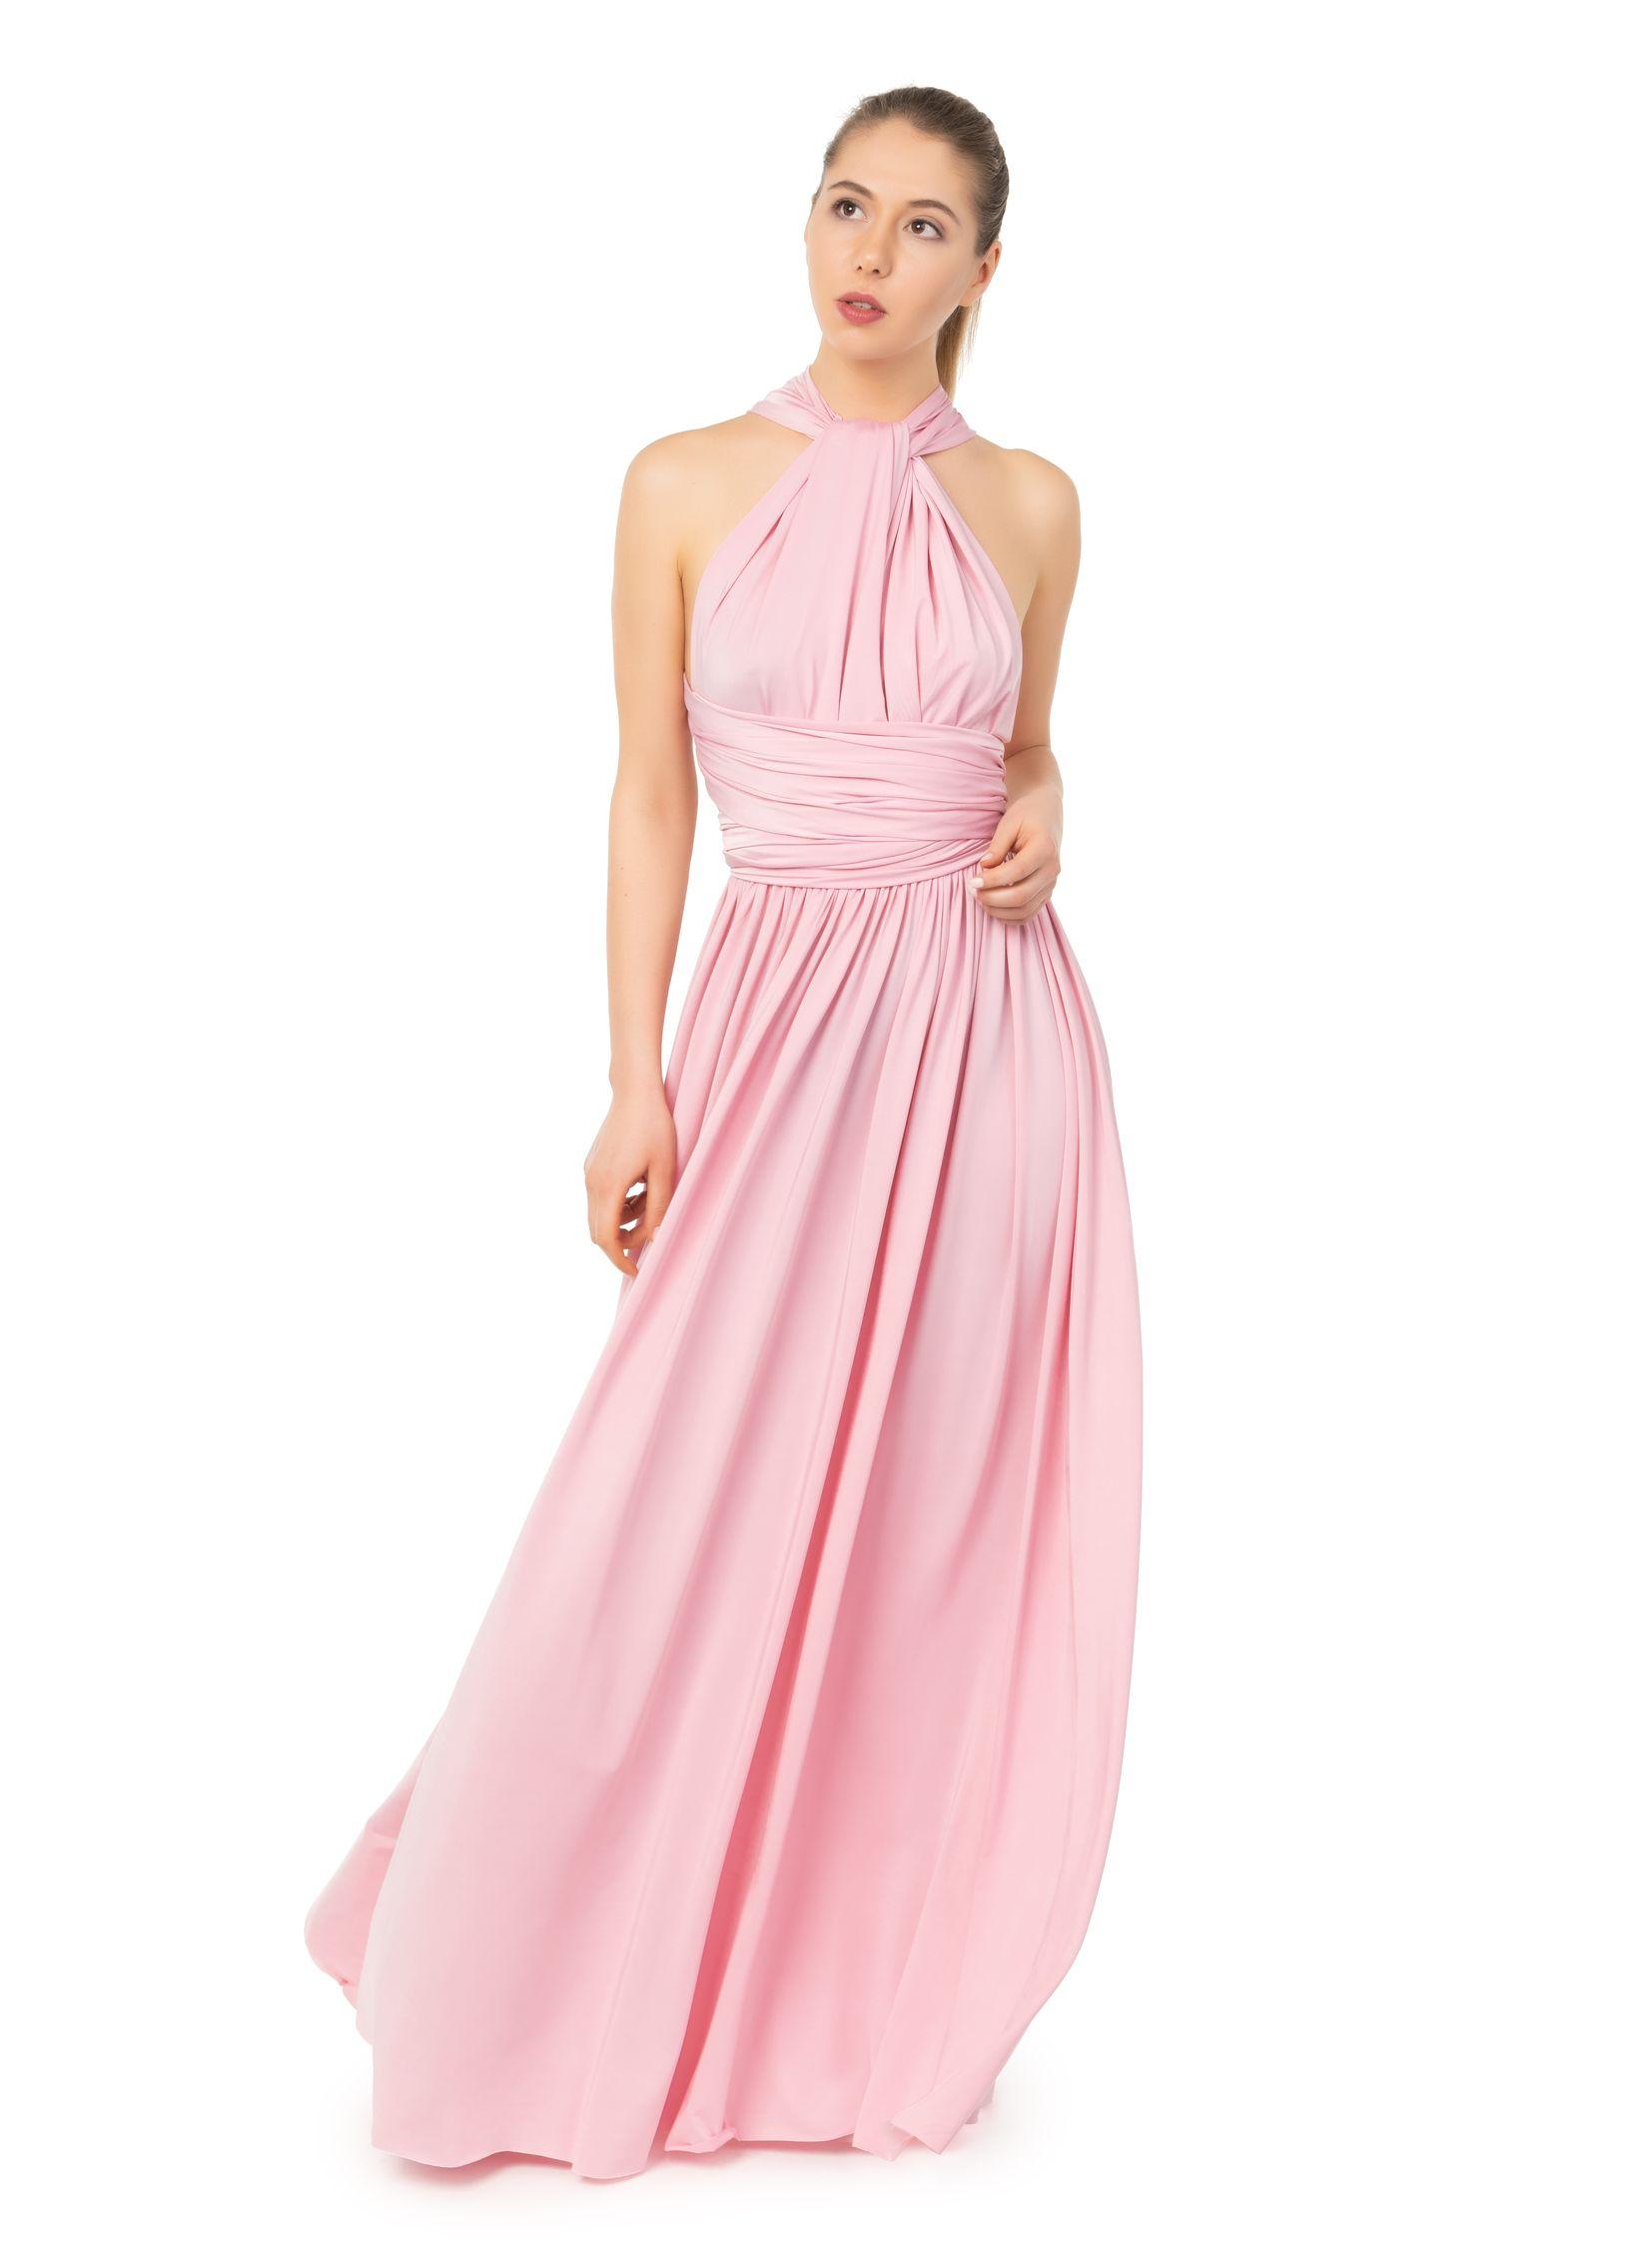 Brautjungfernkleid Wickelkleid Rosa I Größe 34-40